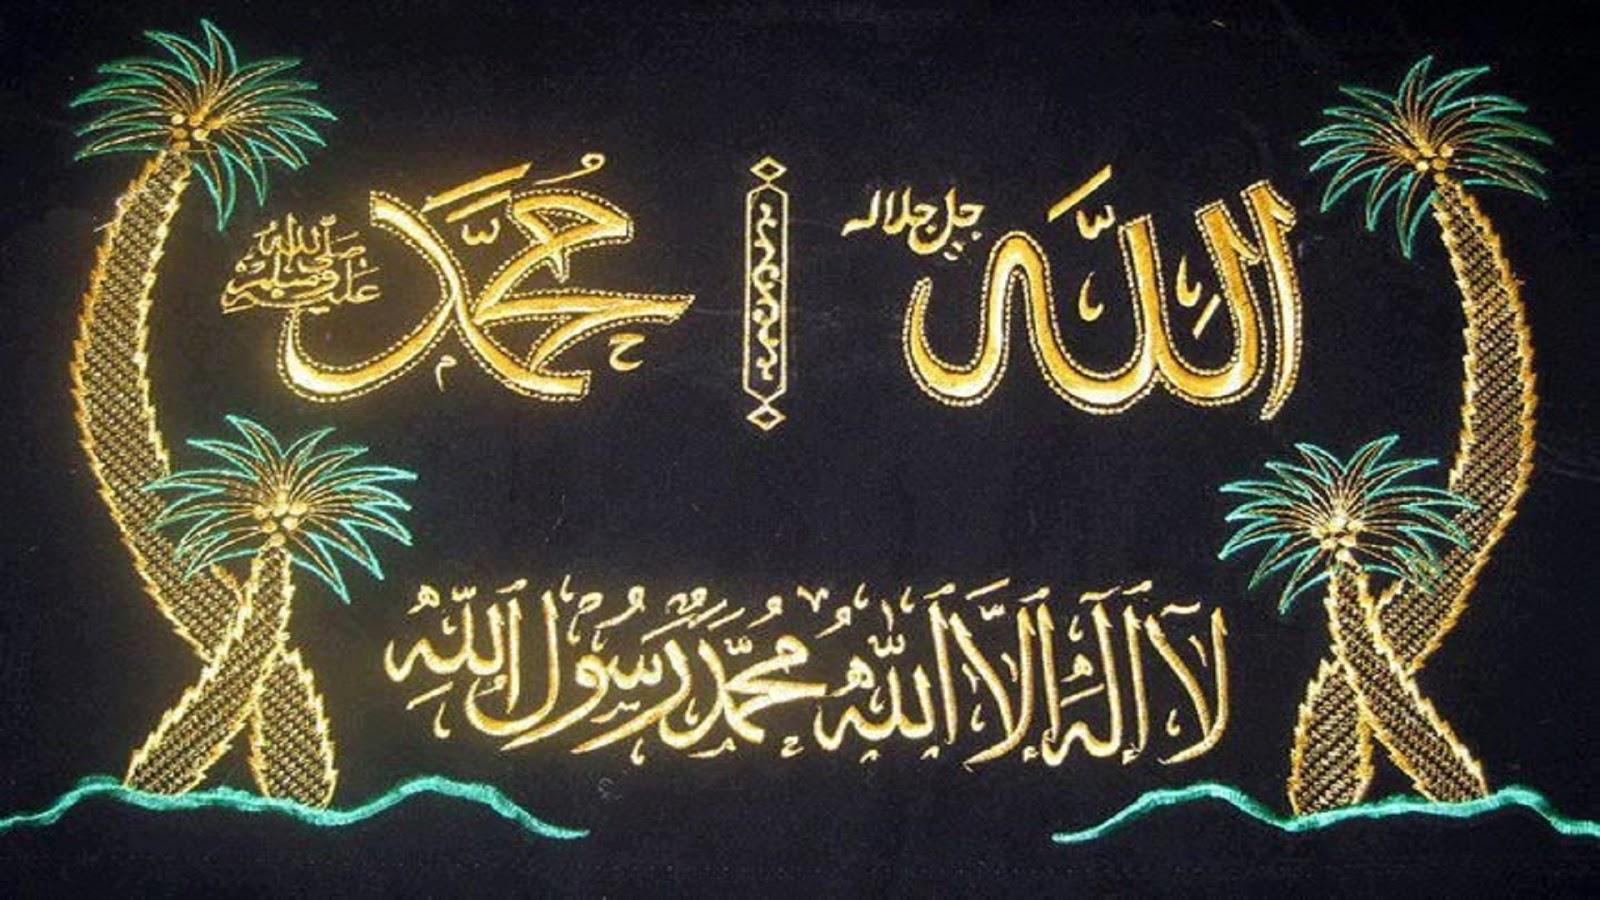 Allah and muhammad wallpaper islamic wallpapers for Gartenpool 3 x 2